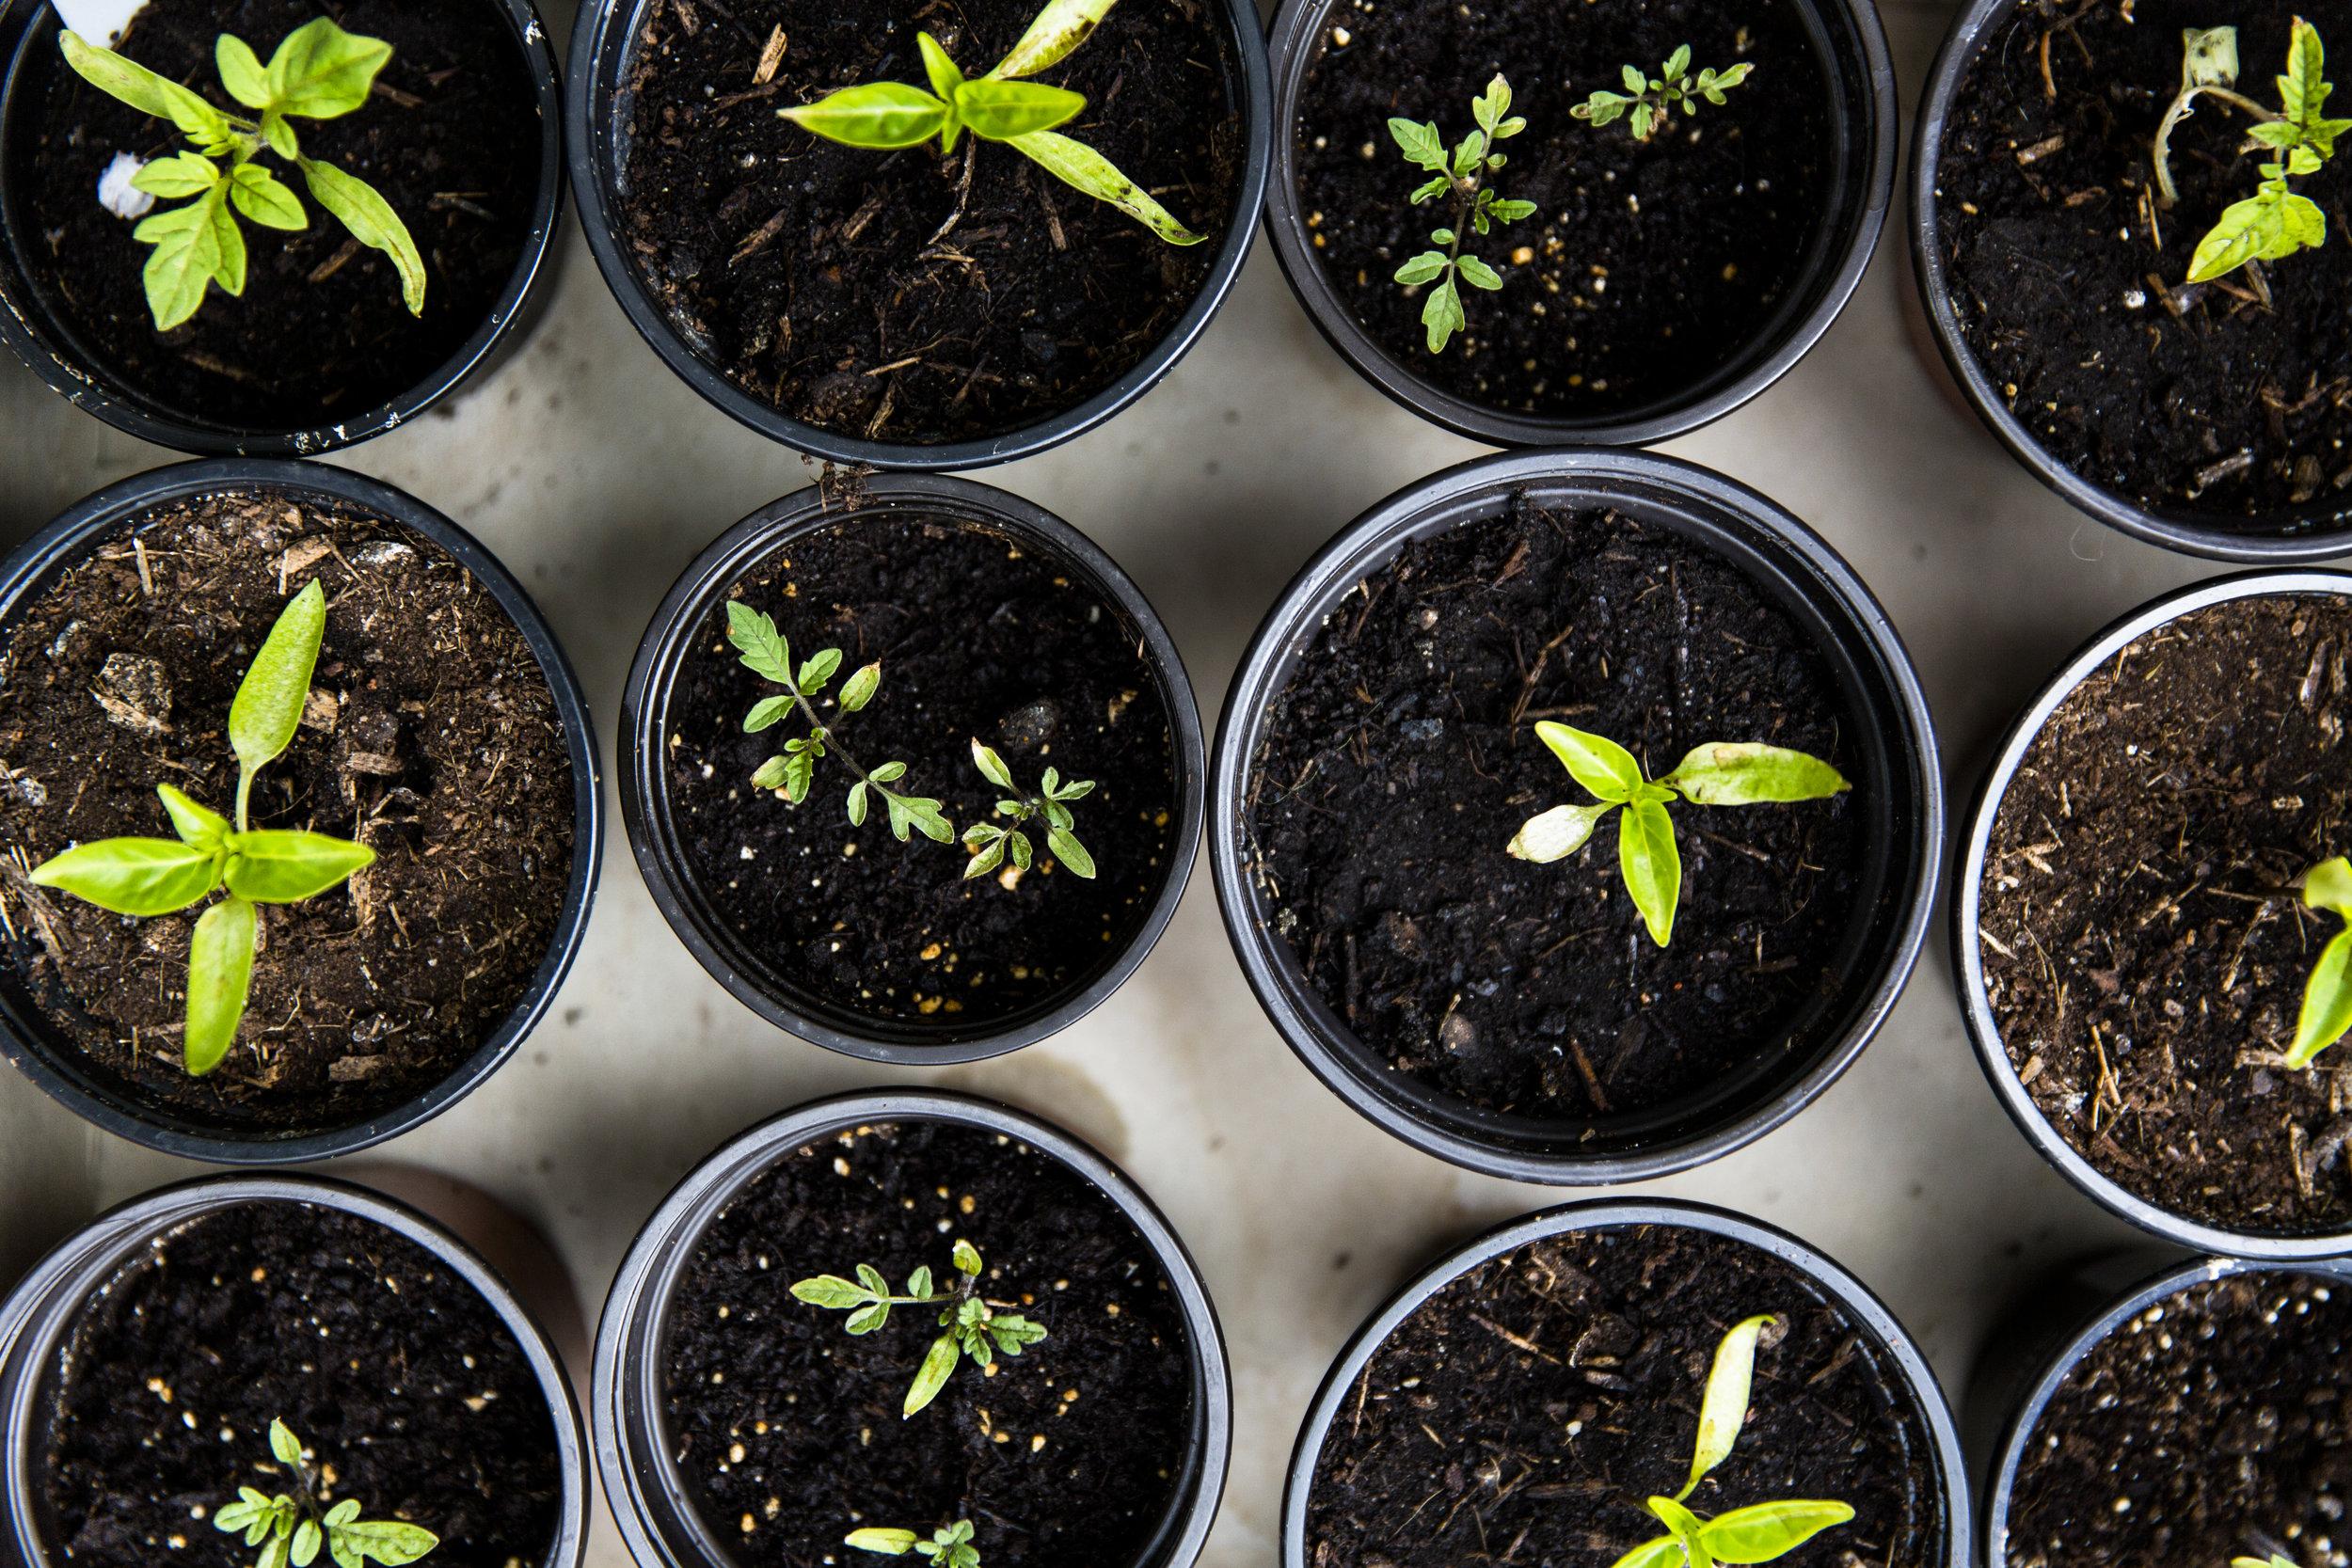 Growth & Establishment - Third Cycle